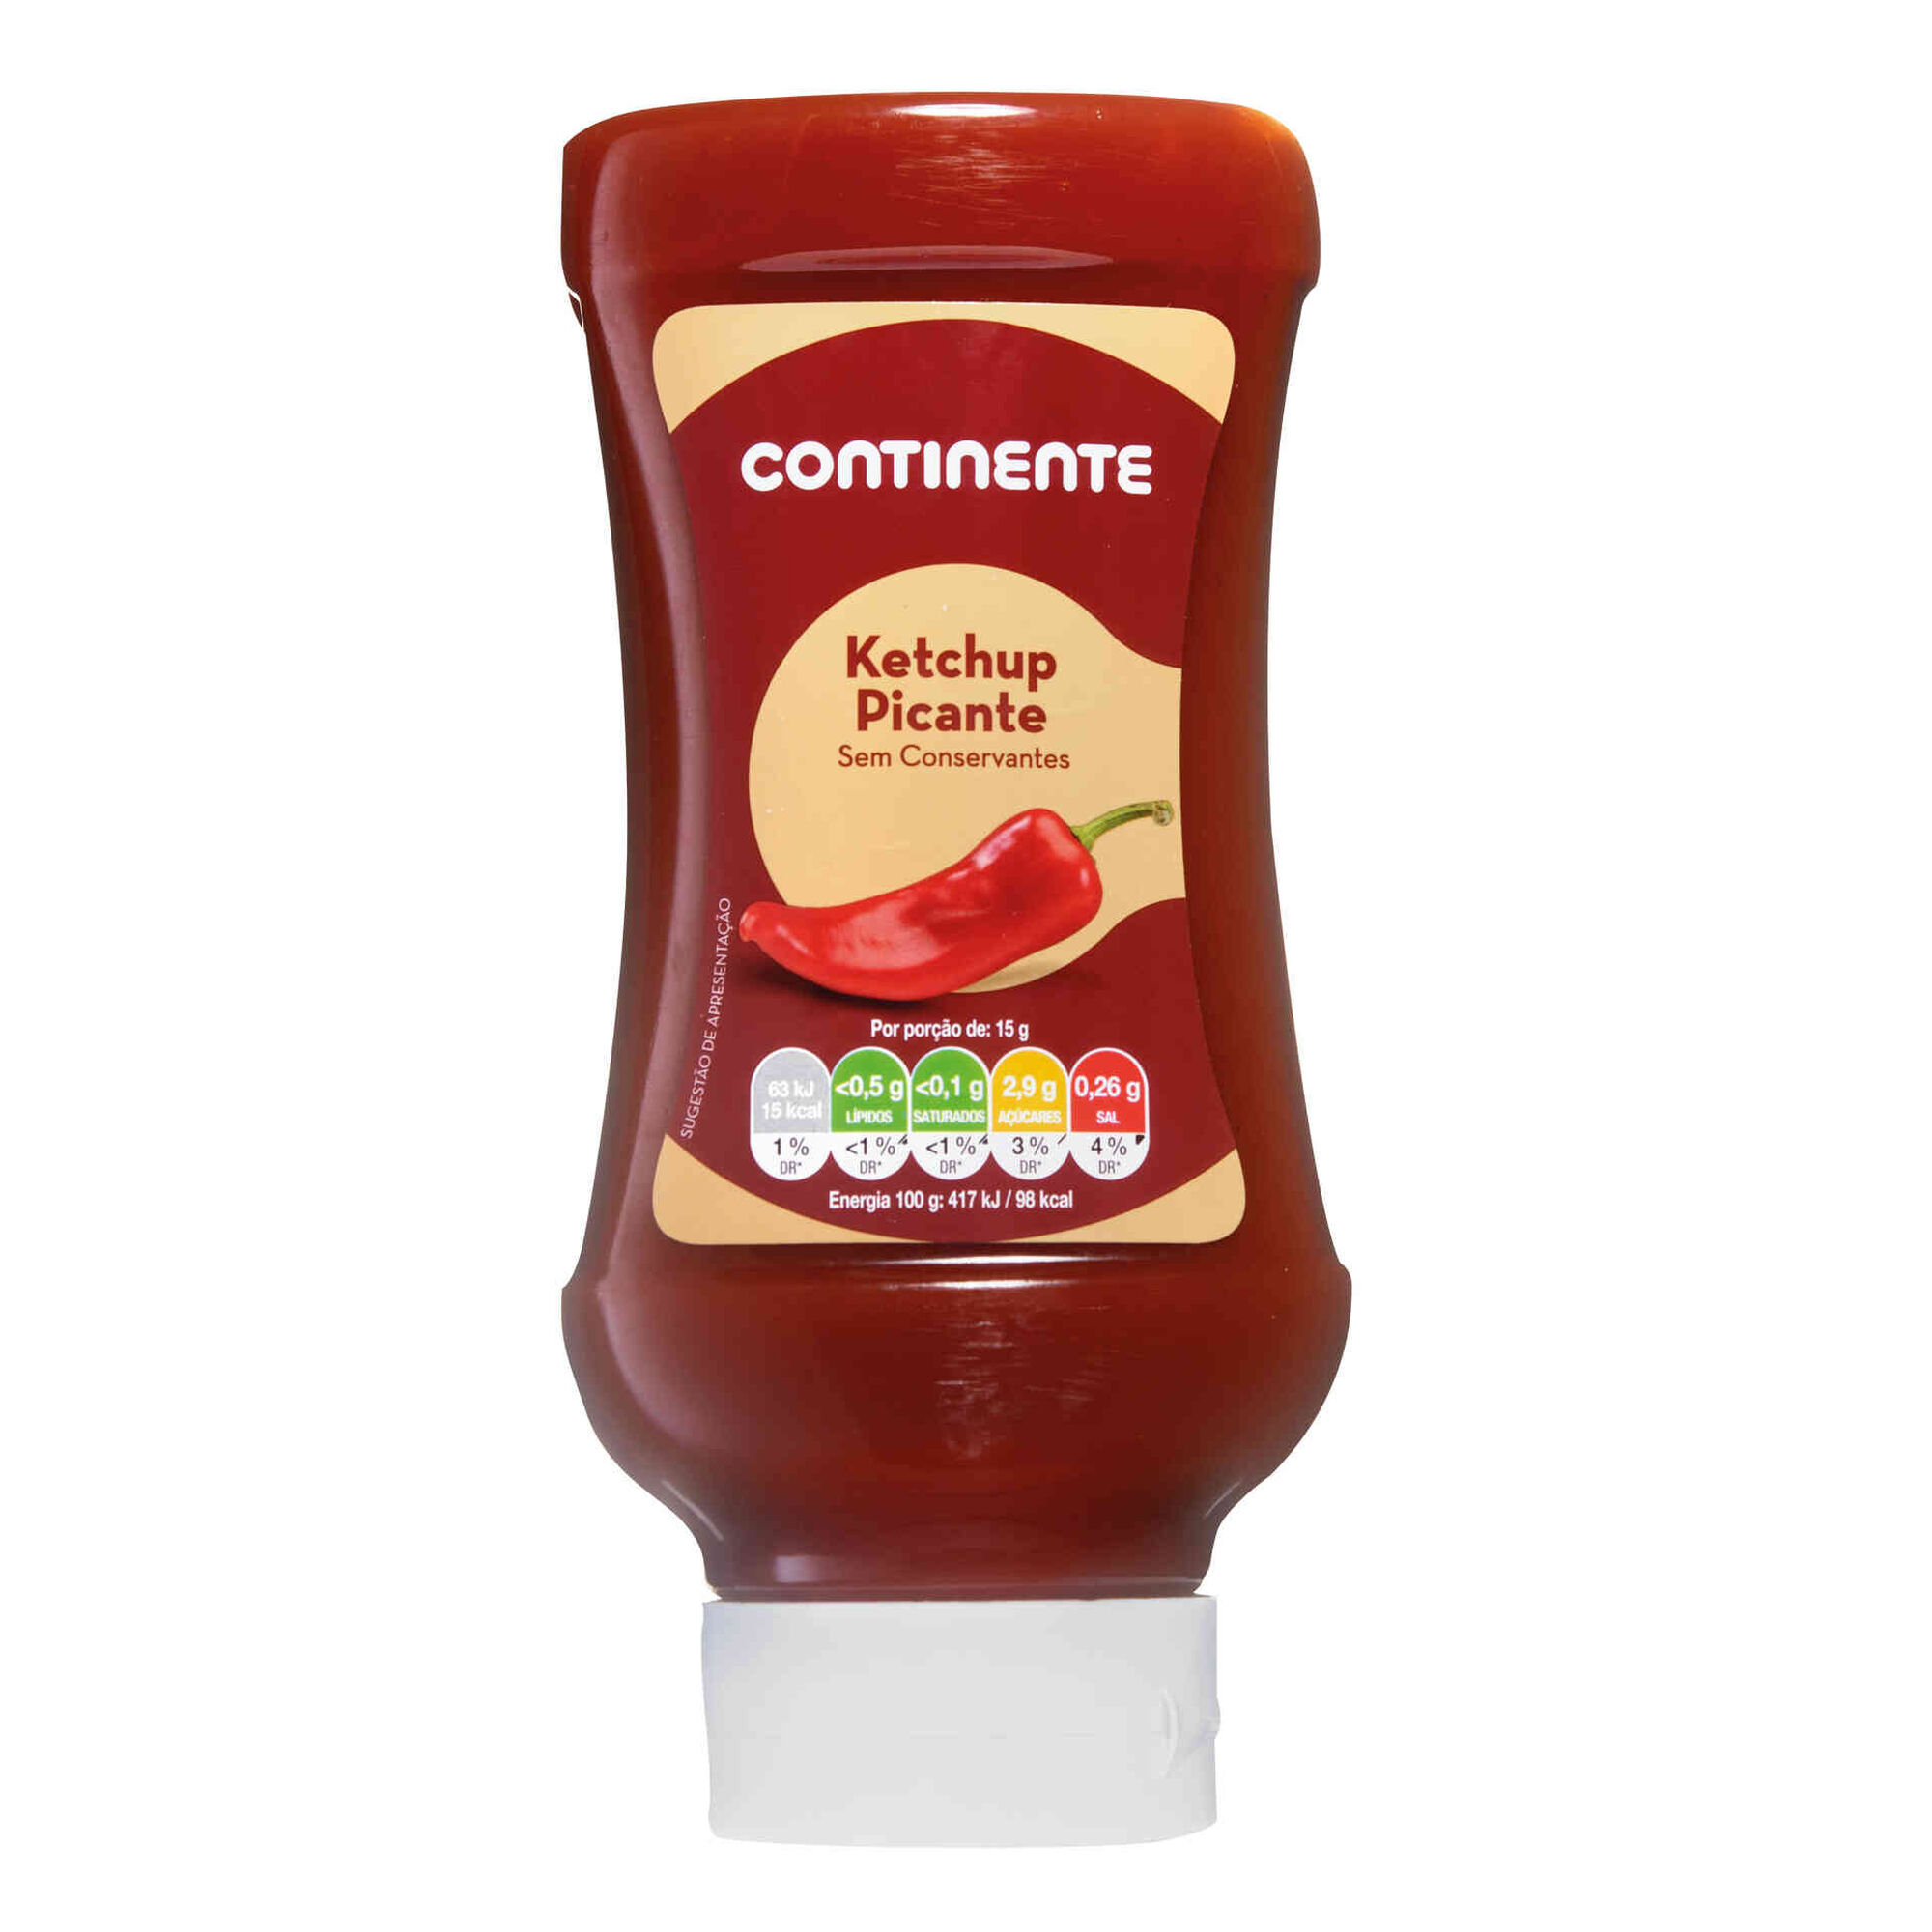 Ketchup Picante Top Down